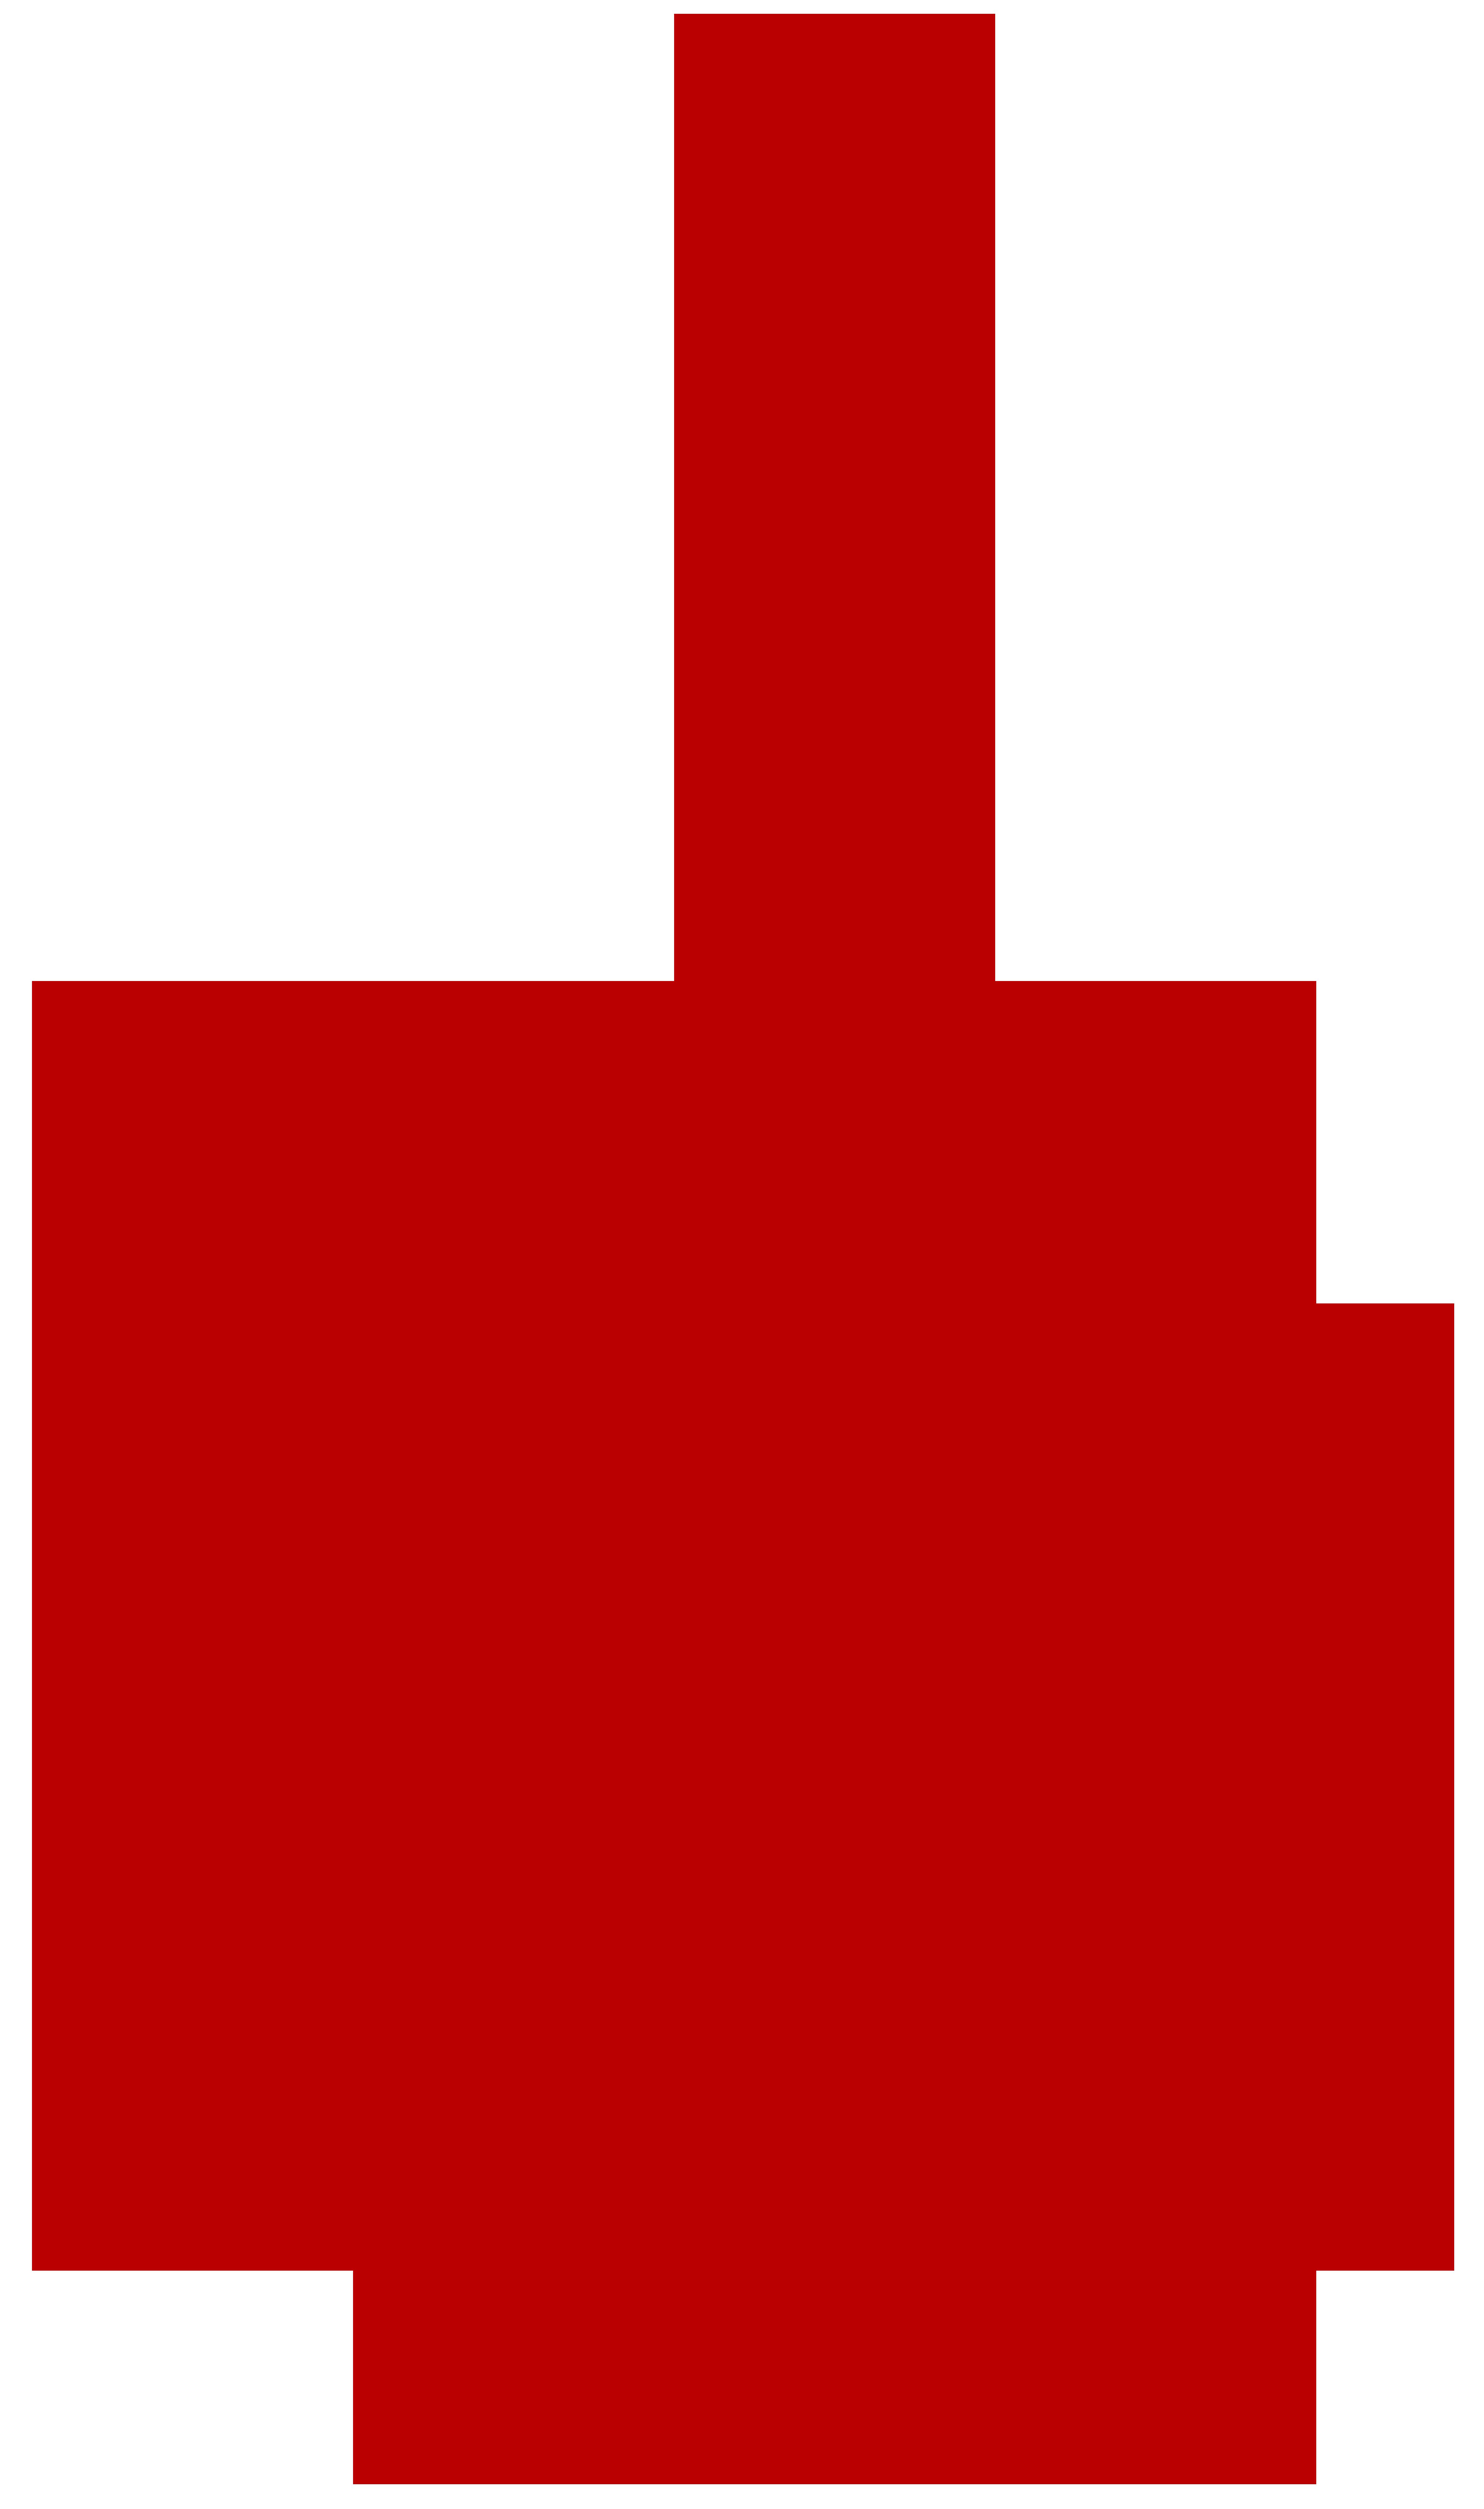 Hanging Heart Transparent PNG Clip Art Image.